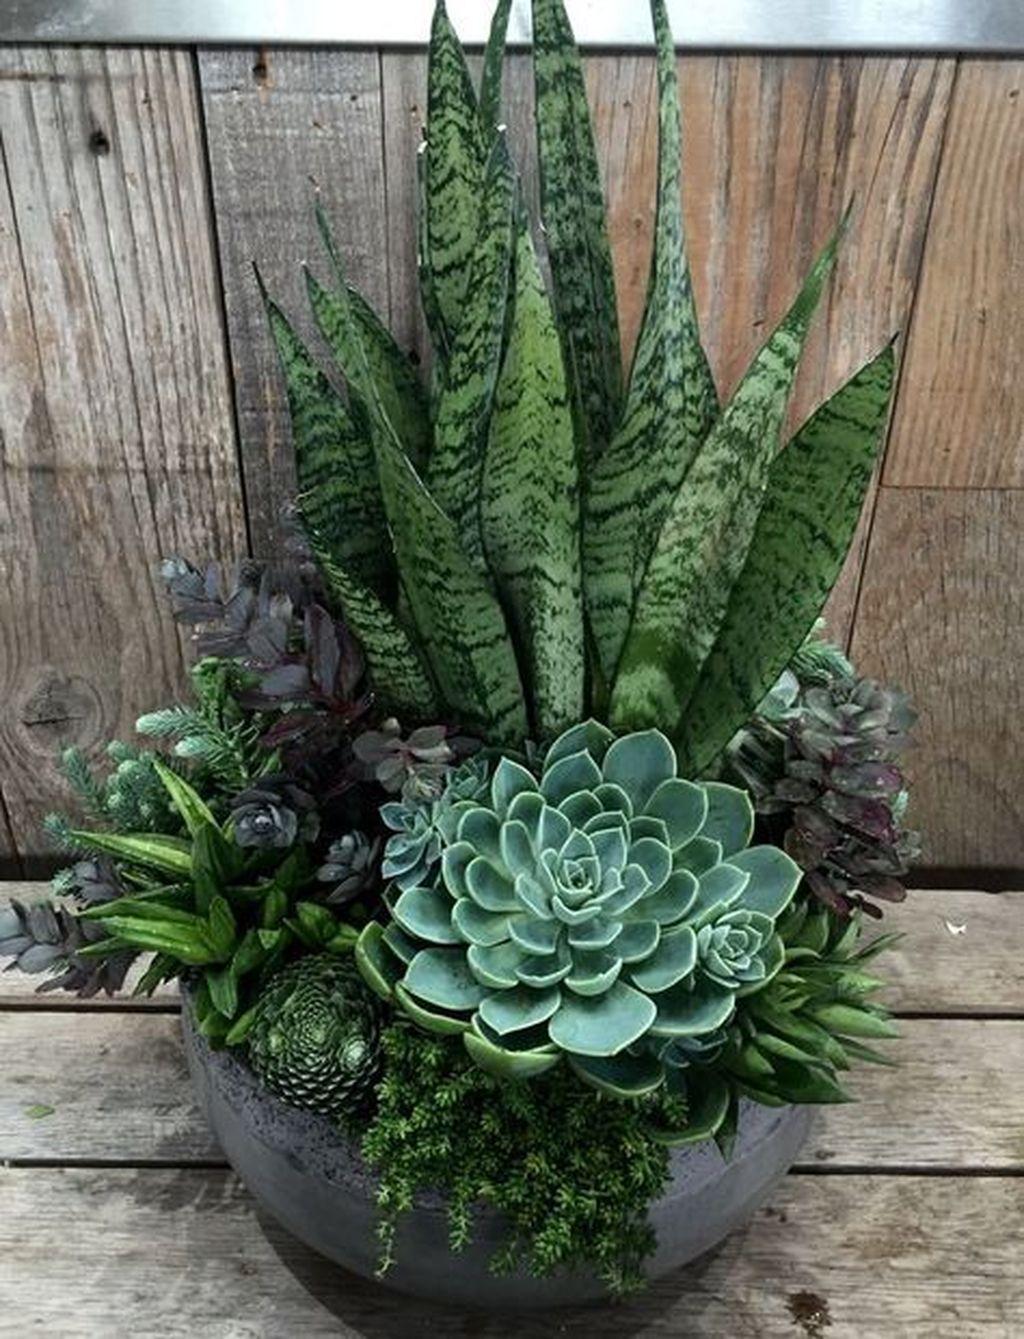 Incredible Cactus Garden Landscaping Ideas Best For Summer 22